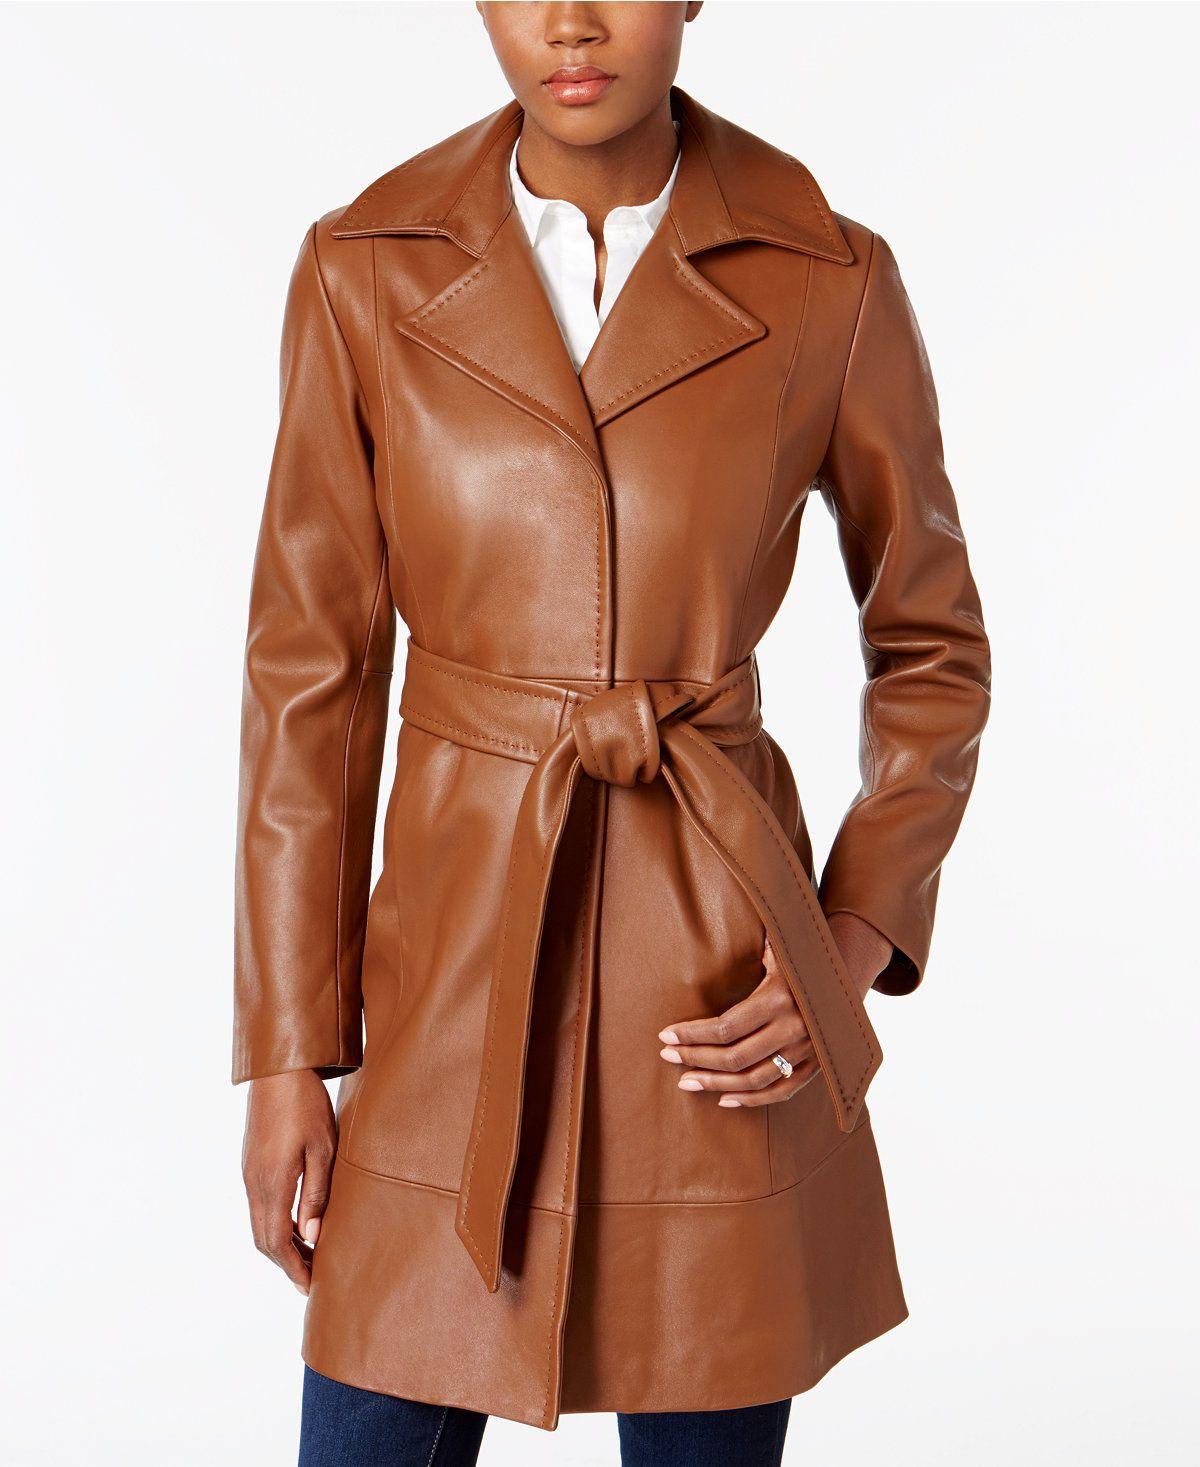 Jones New York Leather Belted Trench Coat Coats Women